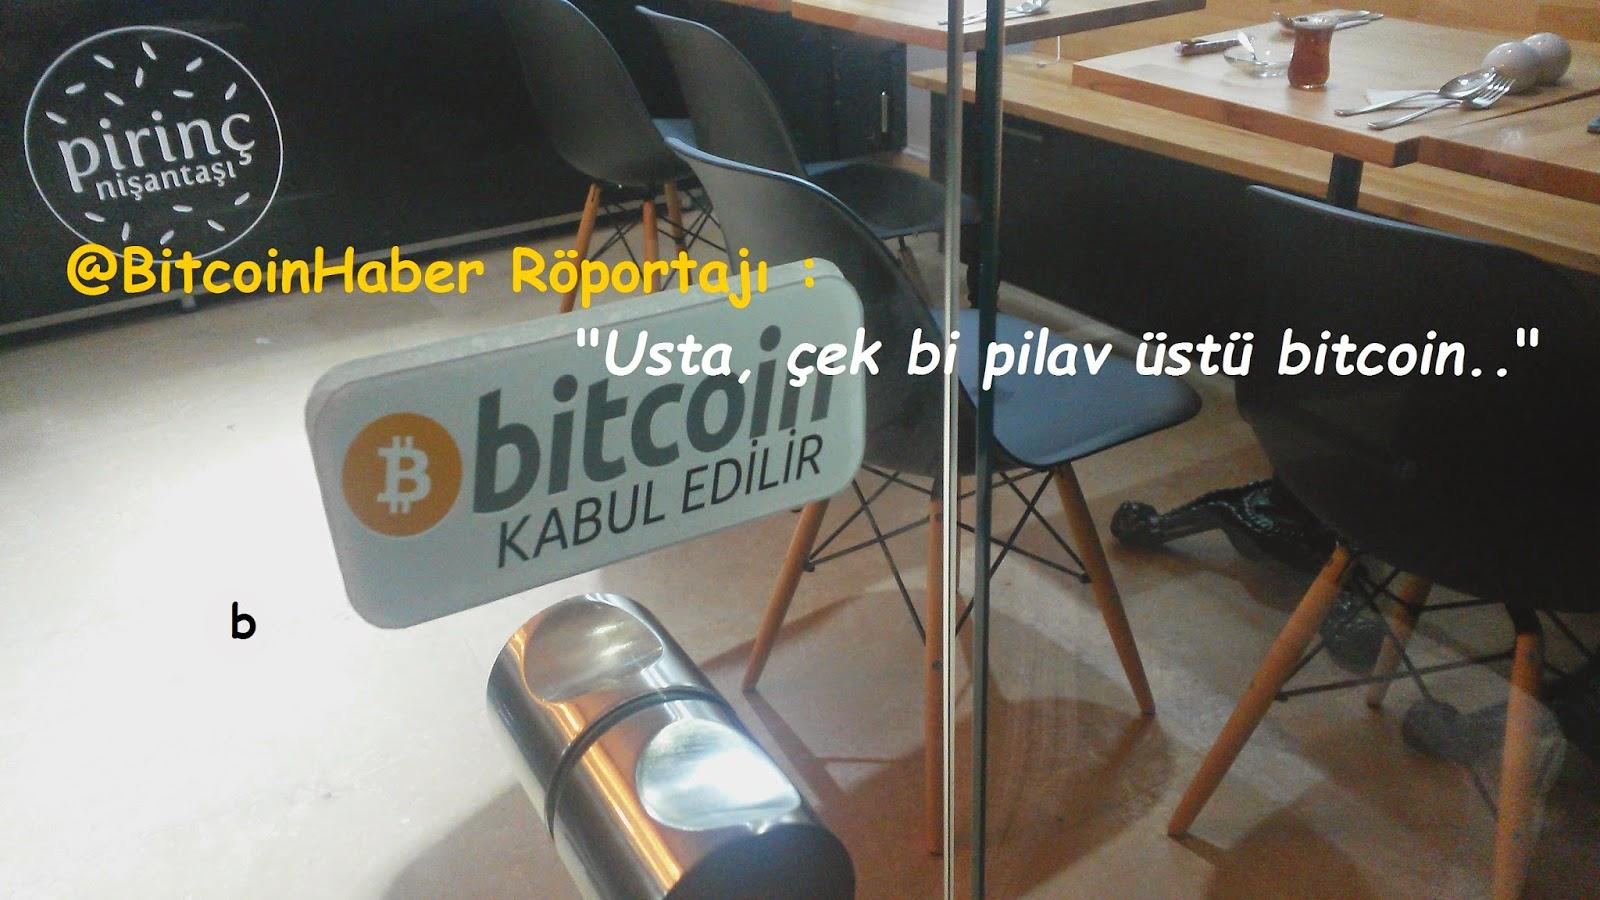 bitcoin-kabul-eden-isletme-pirinc-nisantasi